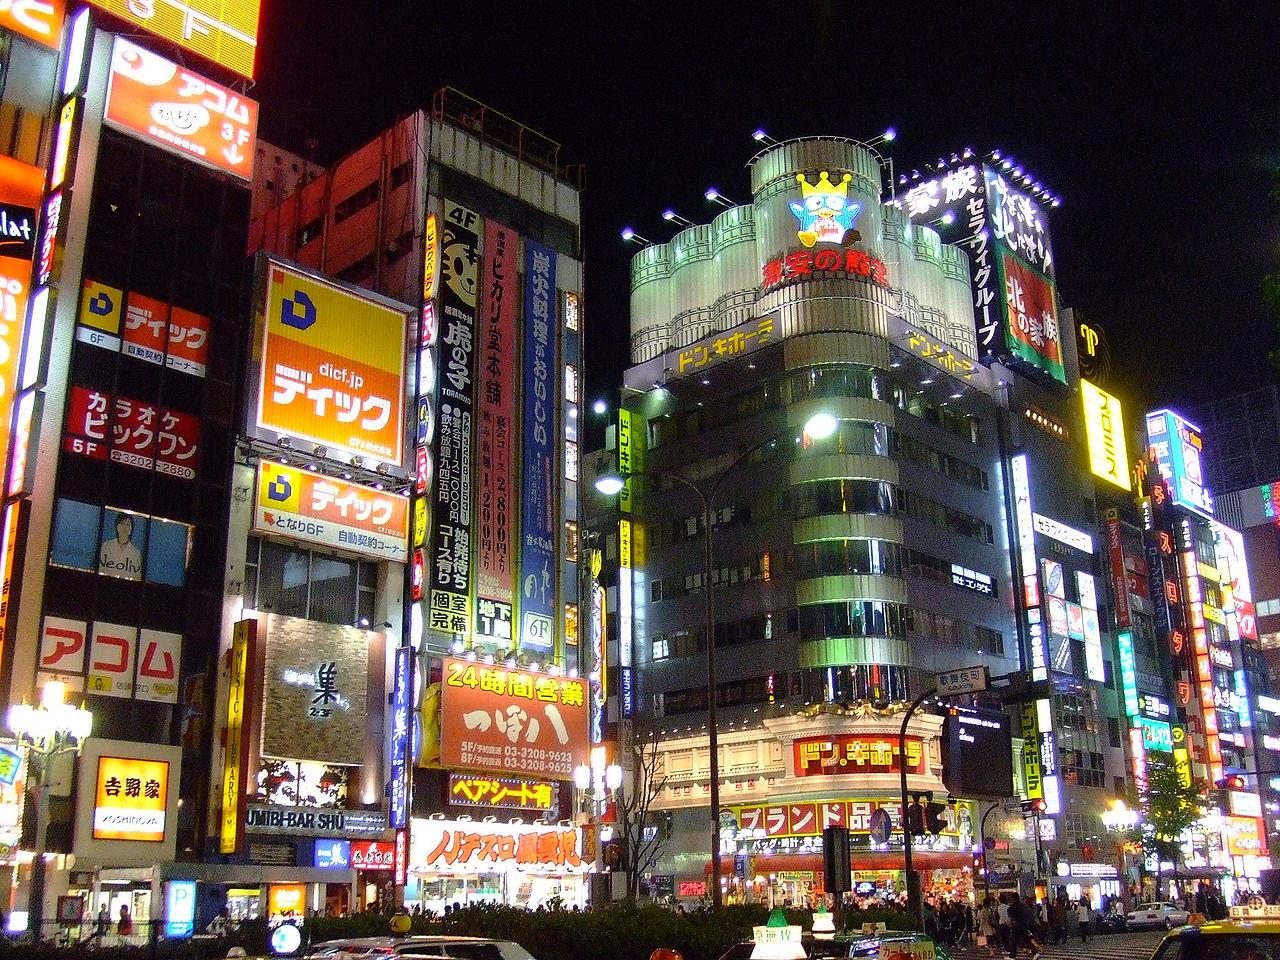 Ночные улицы Синдзюку